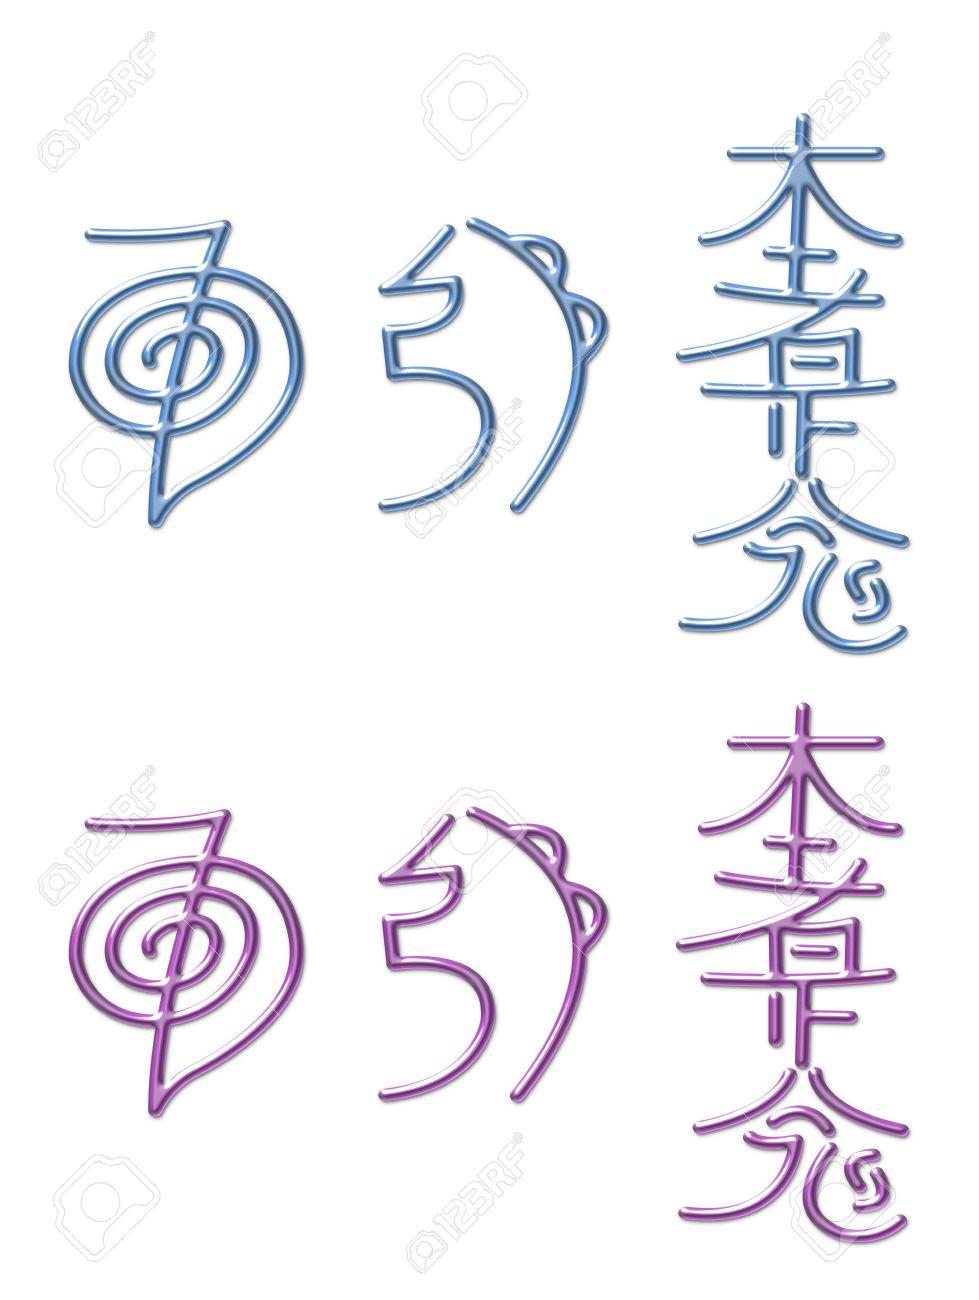 Reiki Healing Energy Symbols A Shiny Pink And A Shiny Blue Stock